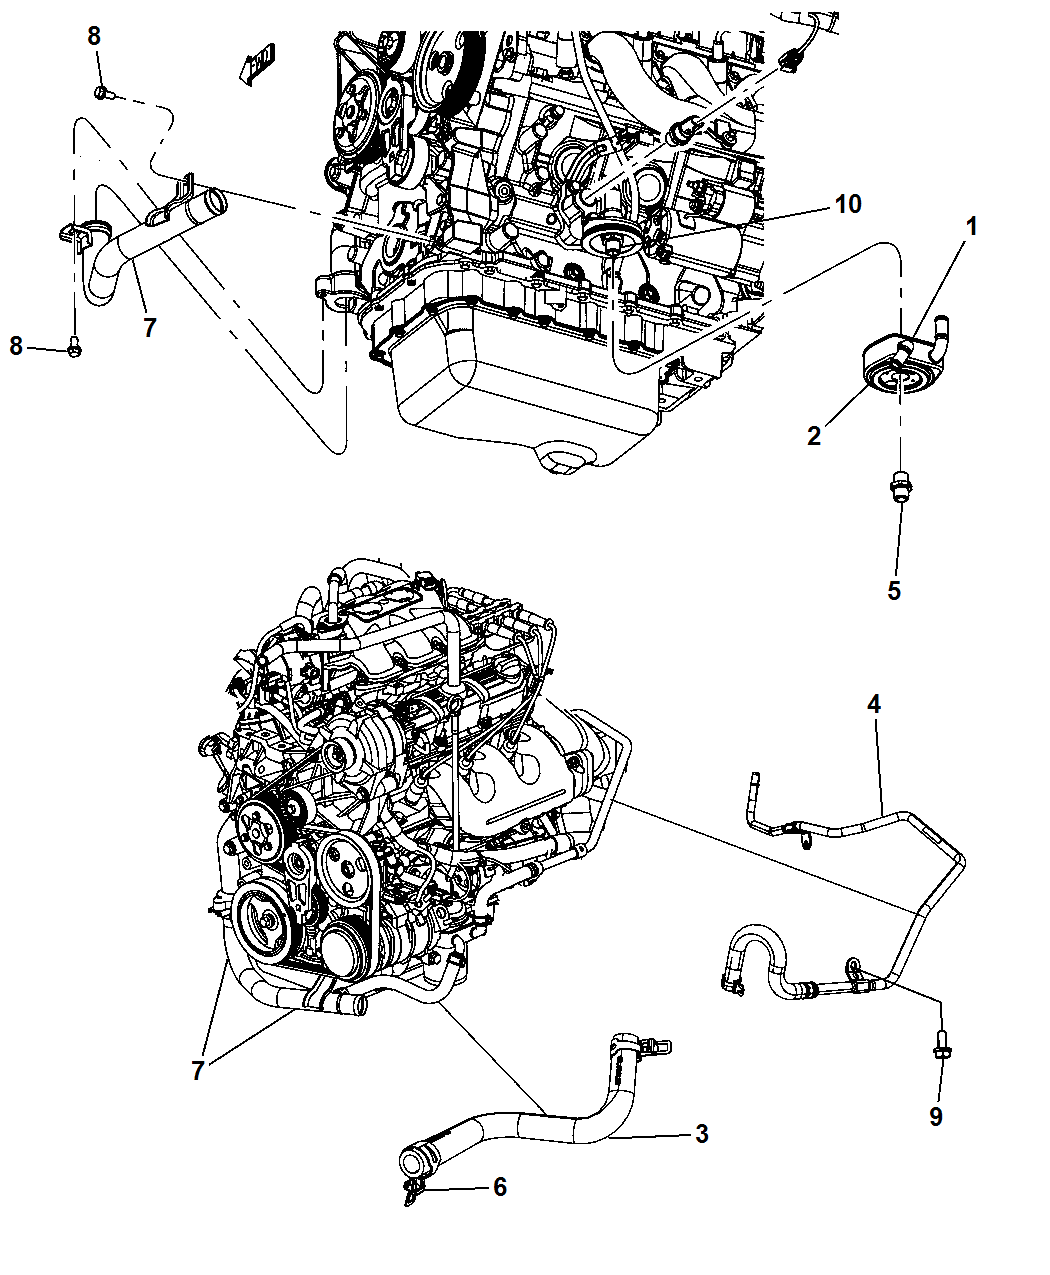 mf_8759] town and country engine diagram 2010 chrysler town and country engine diagram dodge caravan heater hose diagram estep scata lexor indi exmet inst piot cali xeira mohammedshrine ...